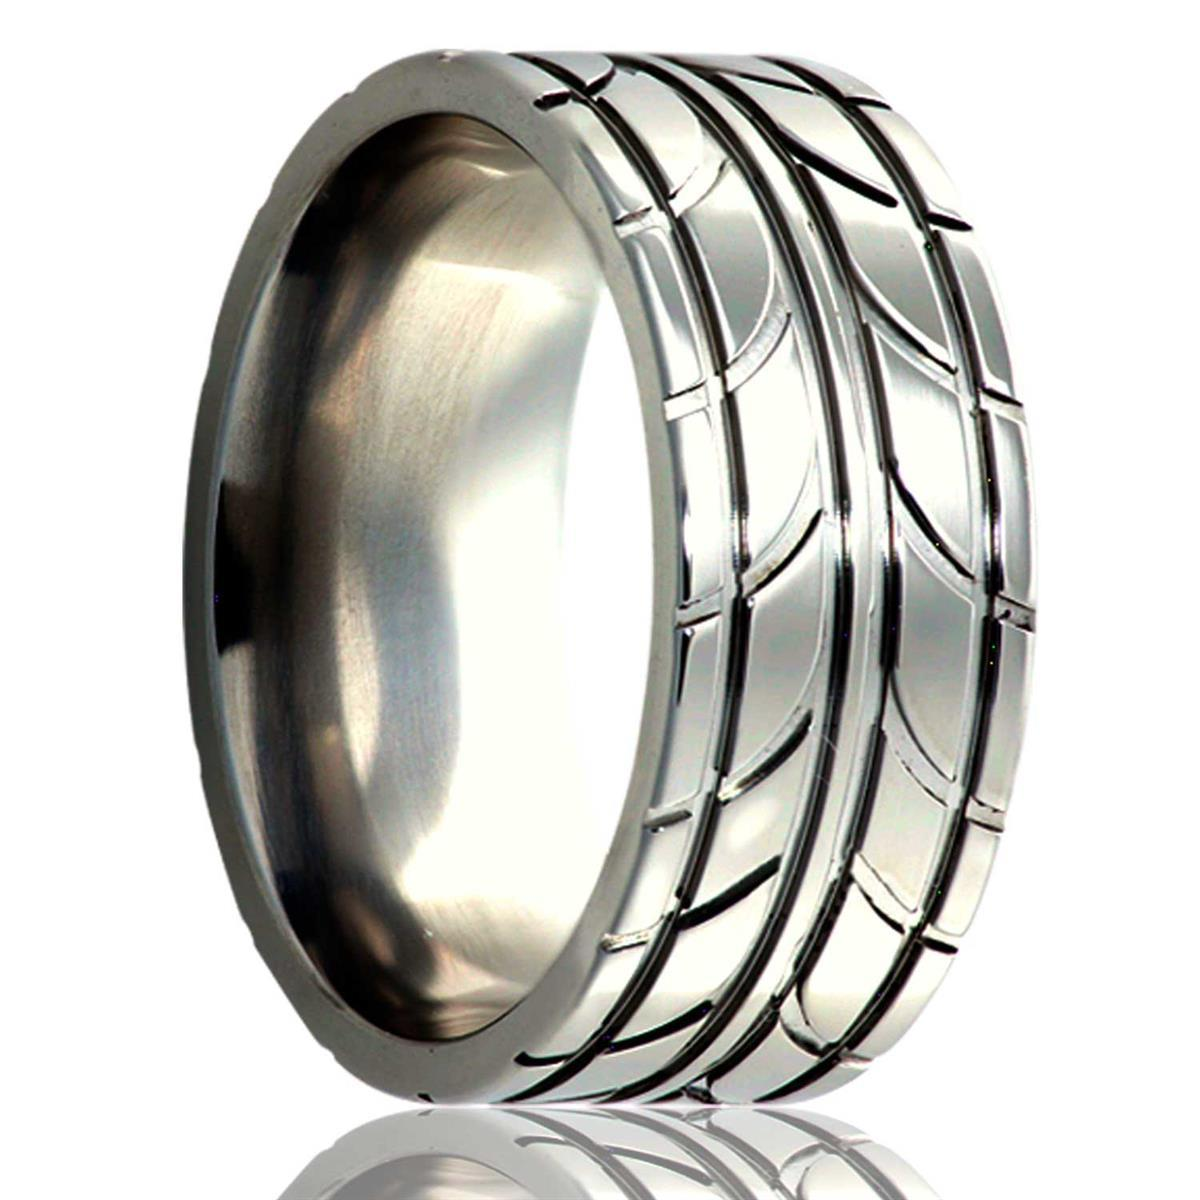 alternative metal, tire tread, men's wedding ring, kluh jewelers